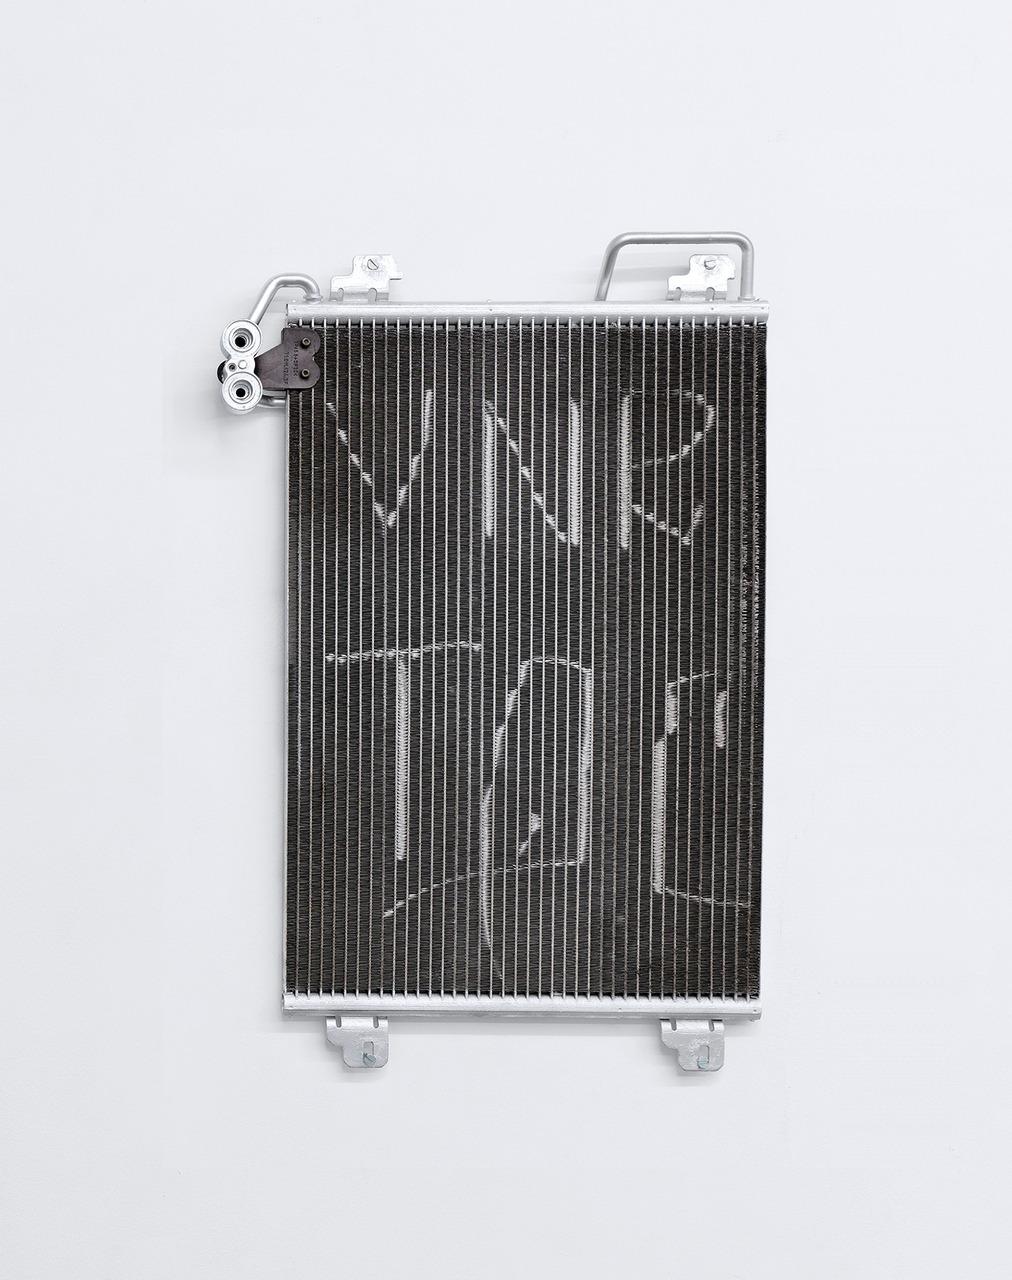 NG 2015-Exo Exo-003ii